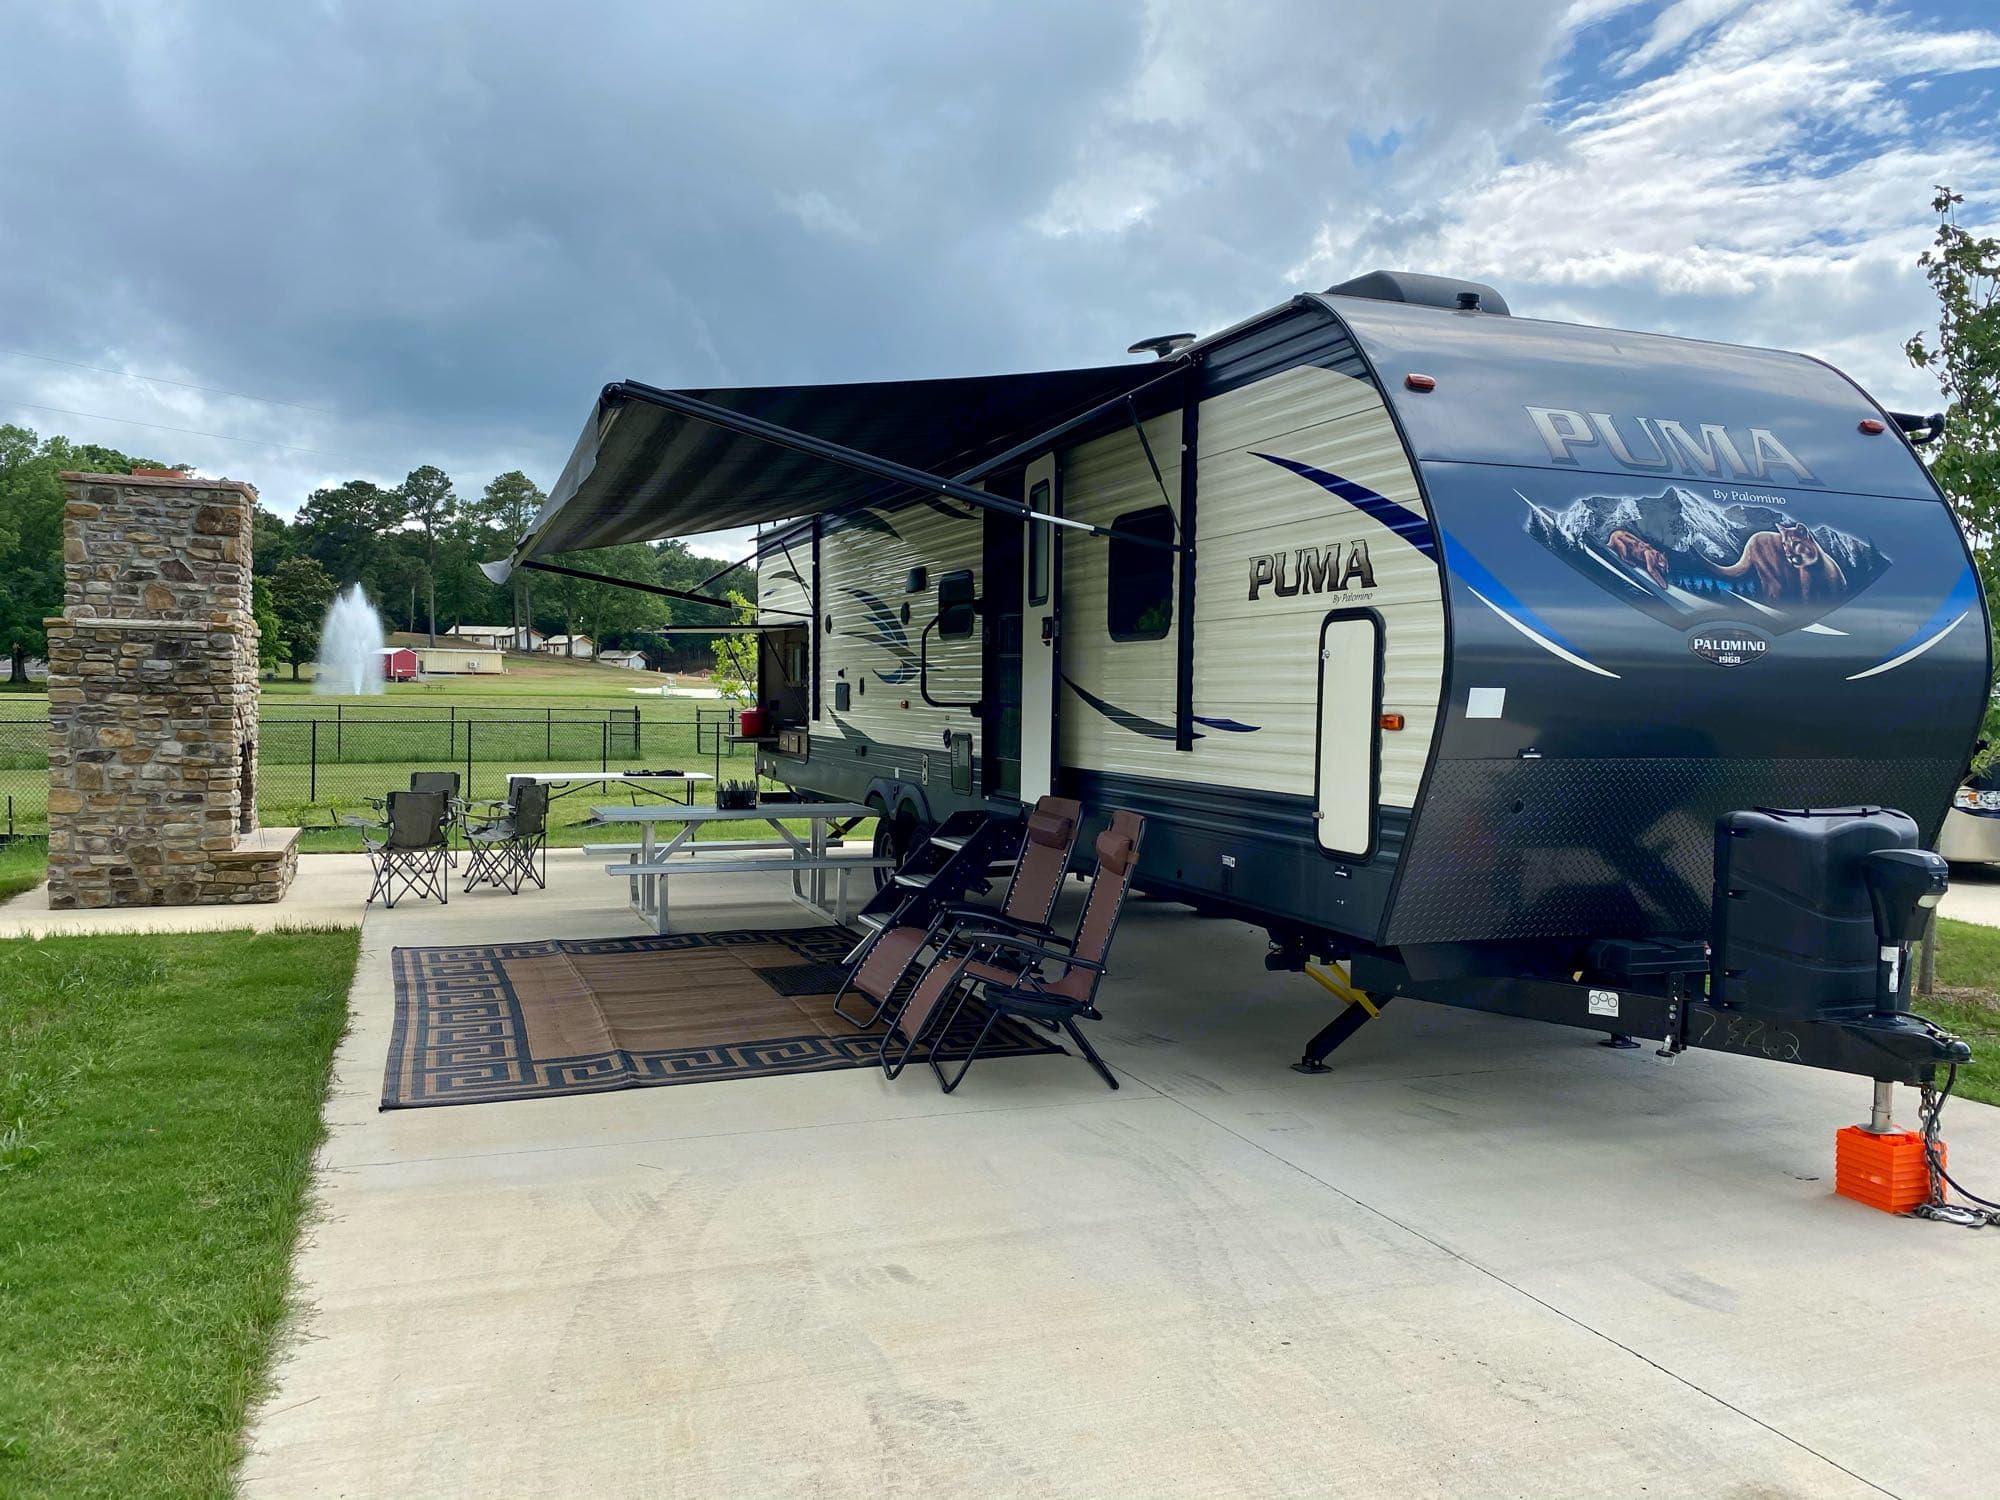 Palomino RV resort in Cullman, AL. Premium site 10. Palomino Puma 2018